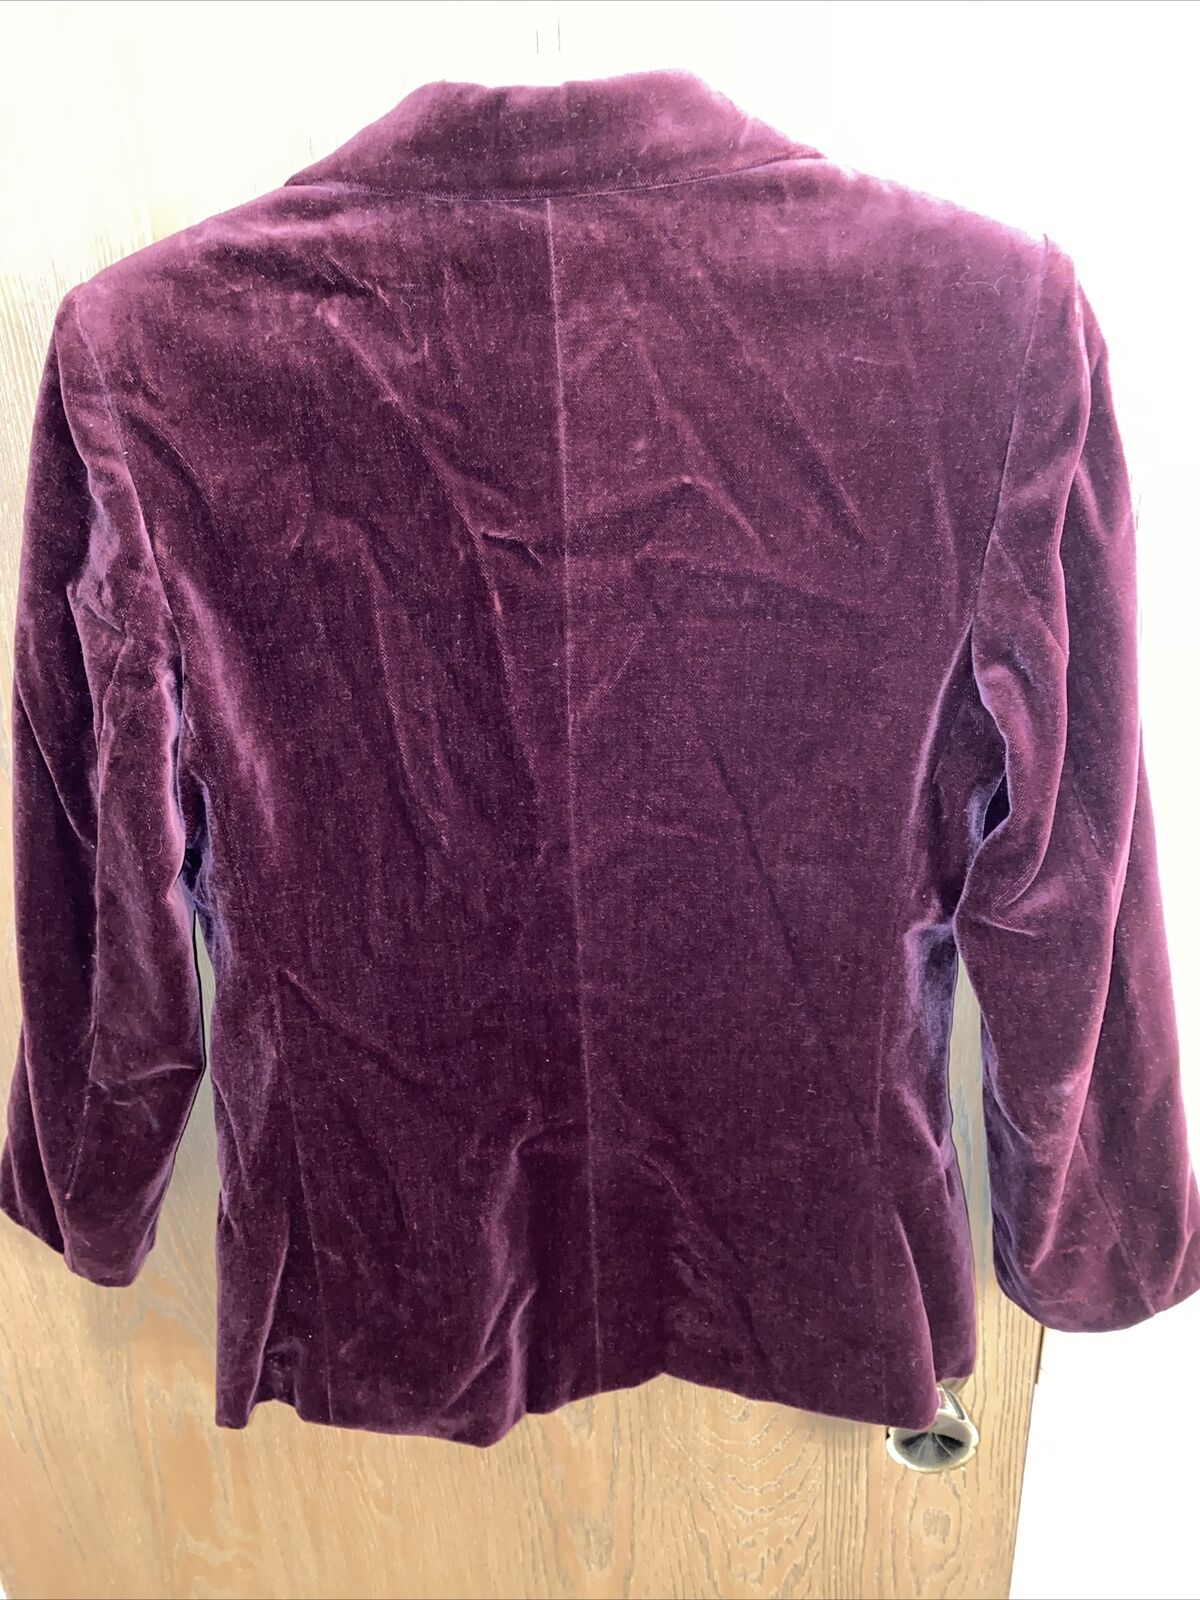 Chaus Red Maroon Velvet Rayon 2 Button Blazer Jac… - image 3